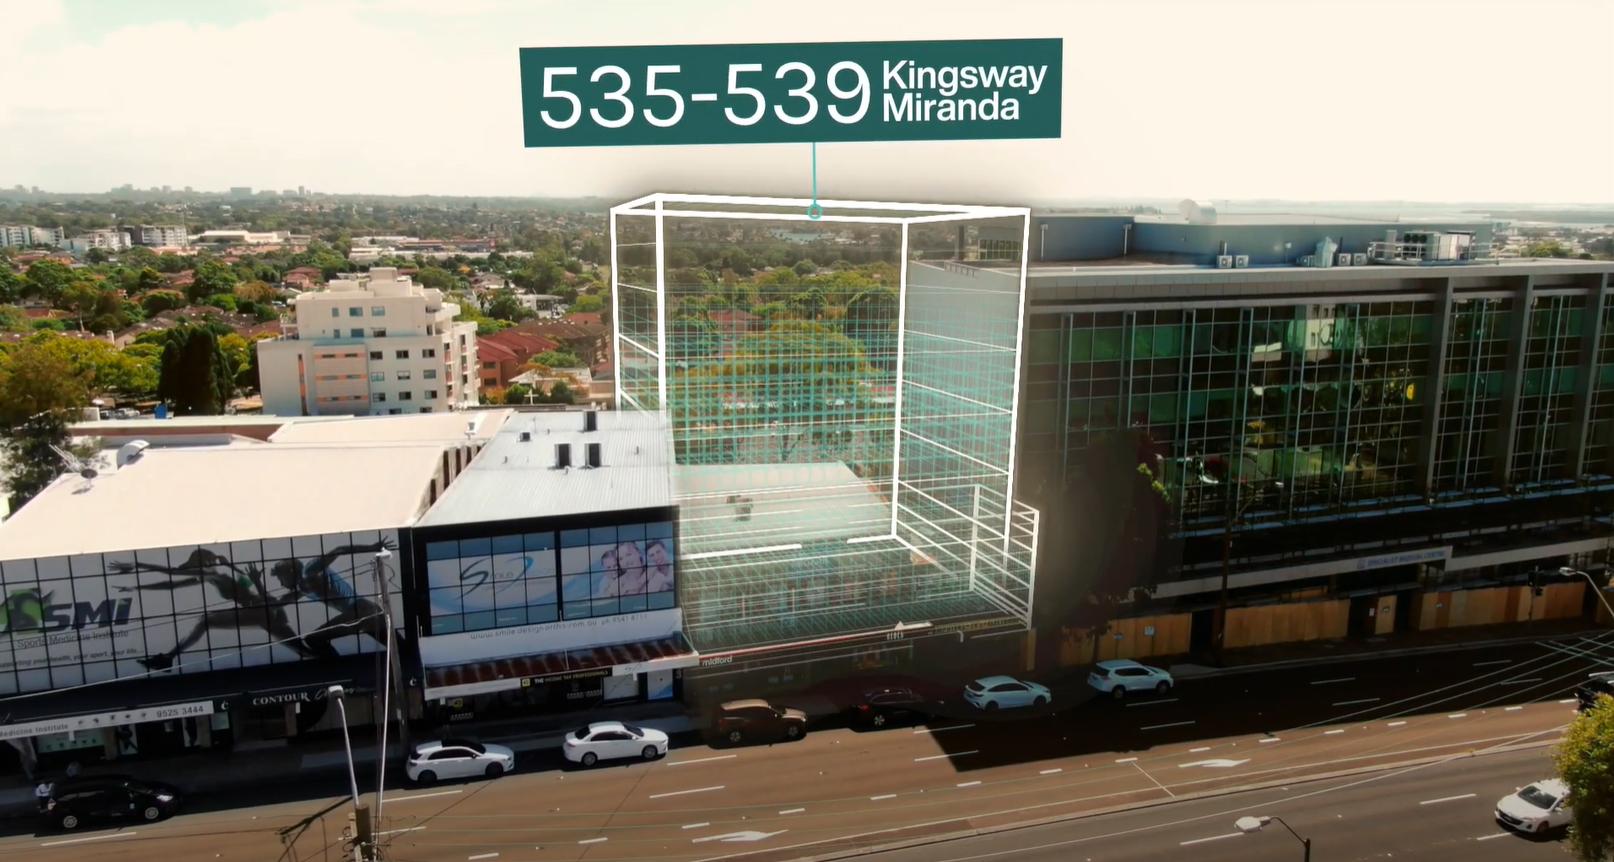 535-539 Kingsway, Miranda, NSW